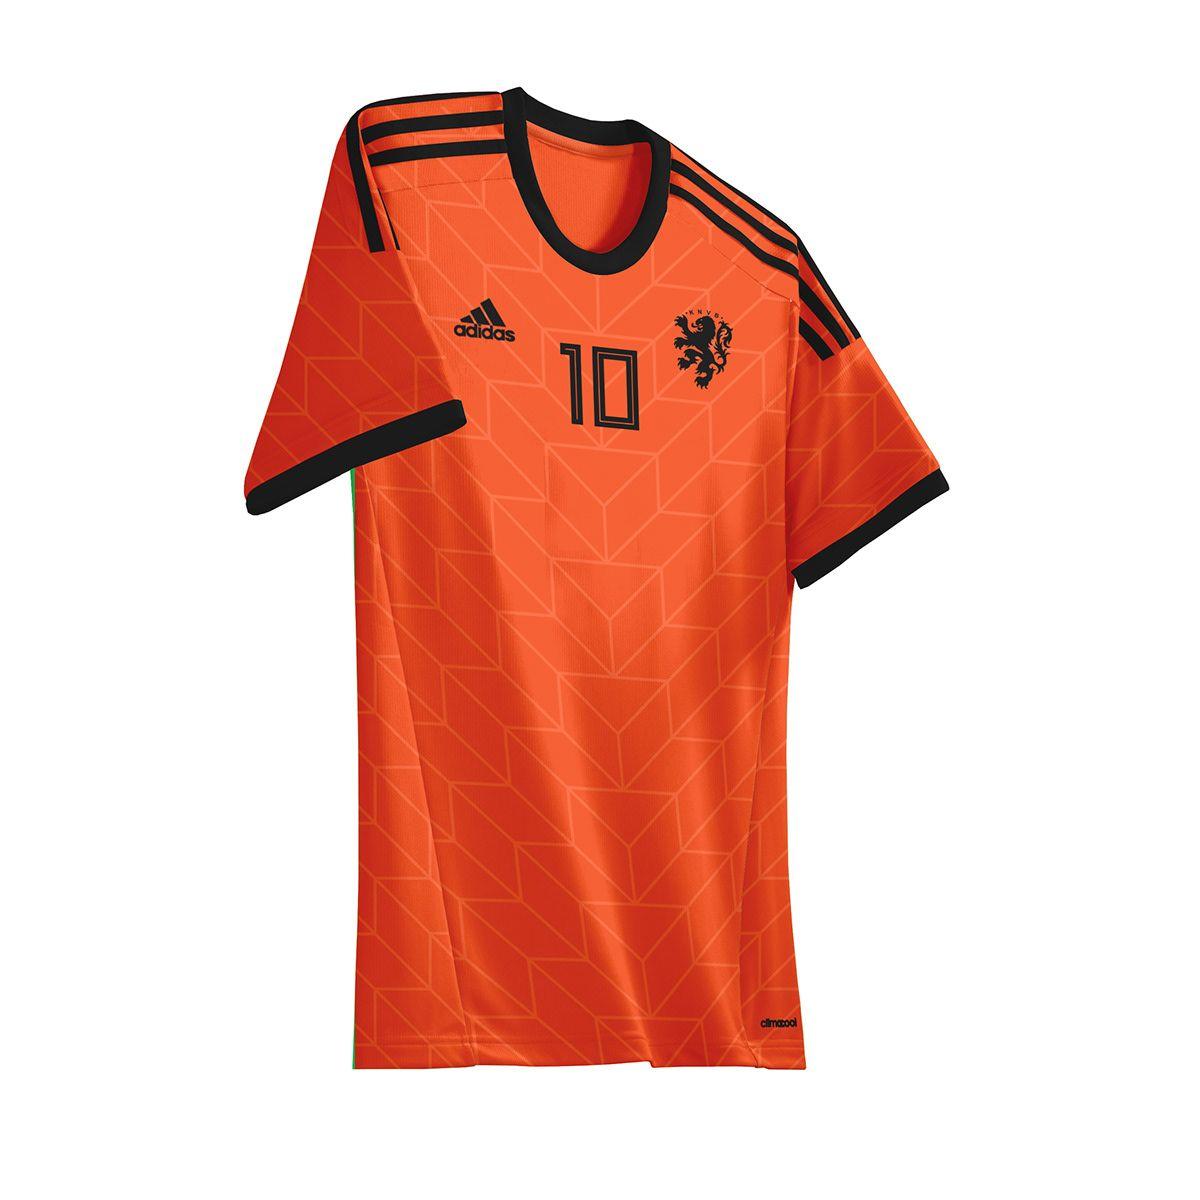 adidas retro world cup shirts